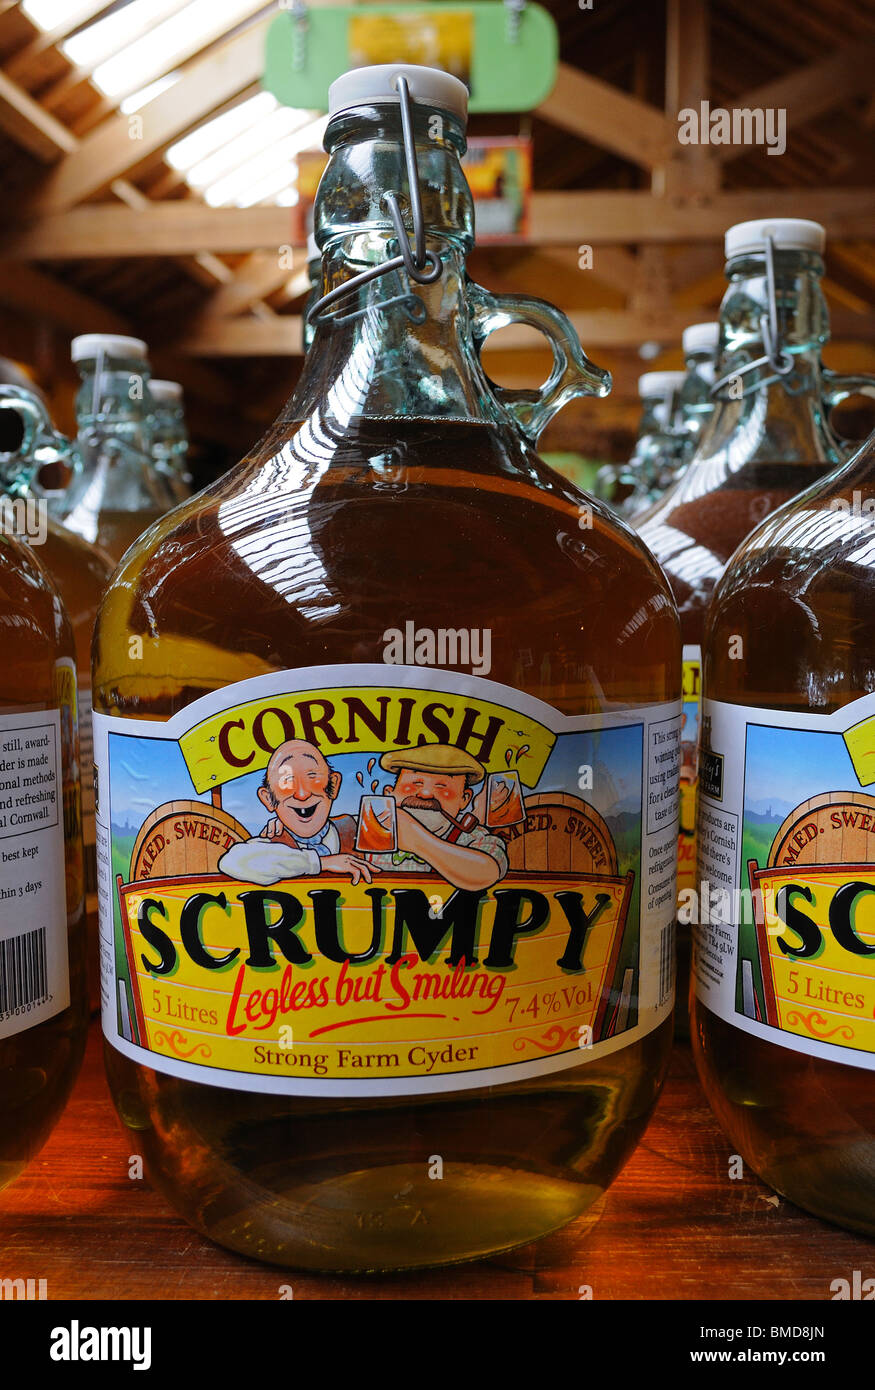 flagons of cornish scrumpy cider , truro, cornwall, uk Stock Photo